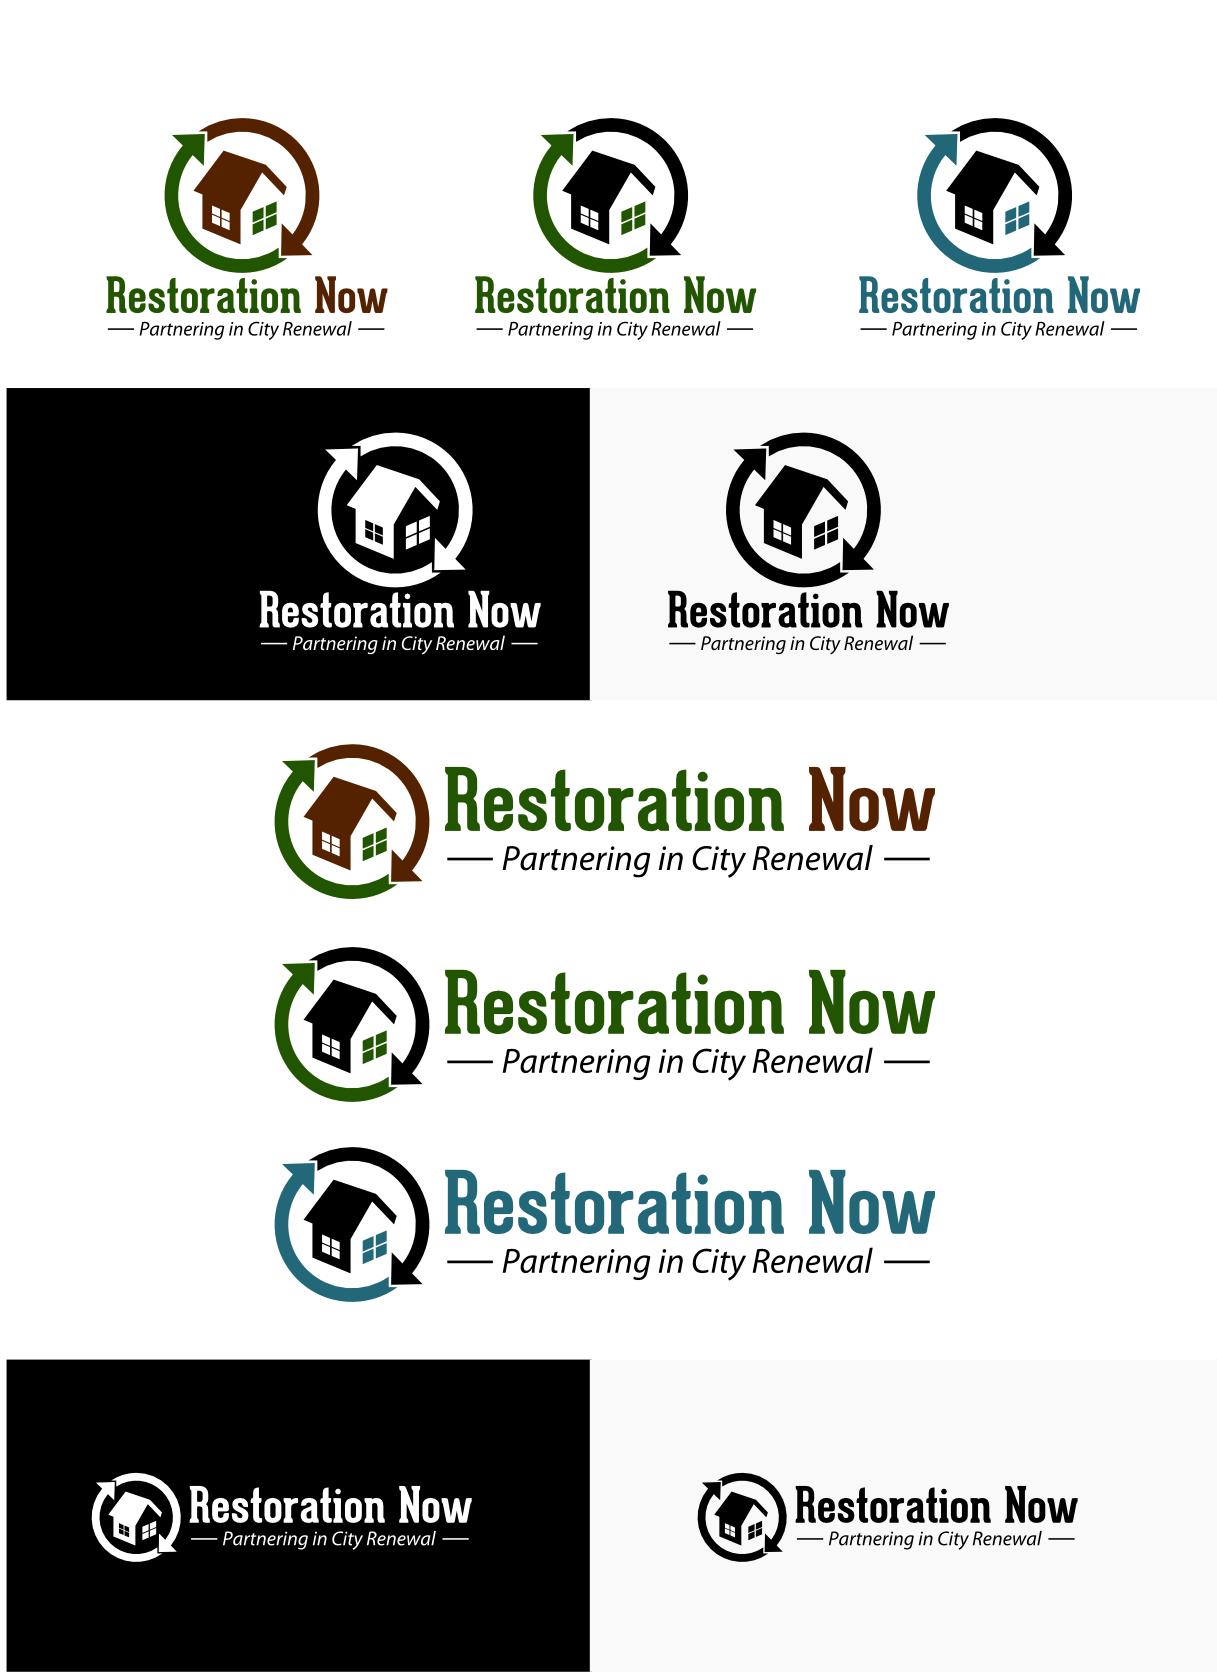 Restoration Now needs a new logo